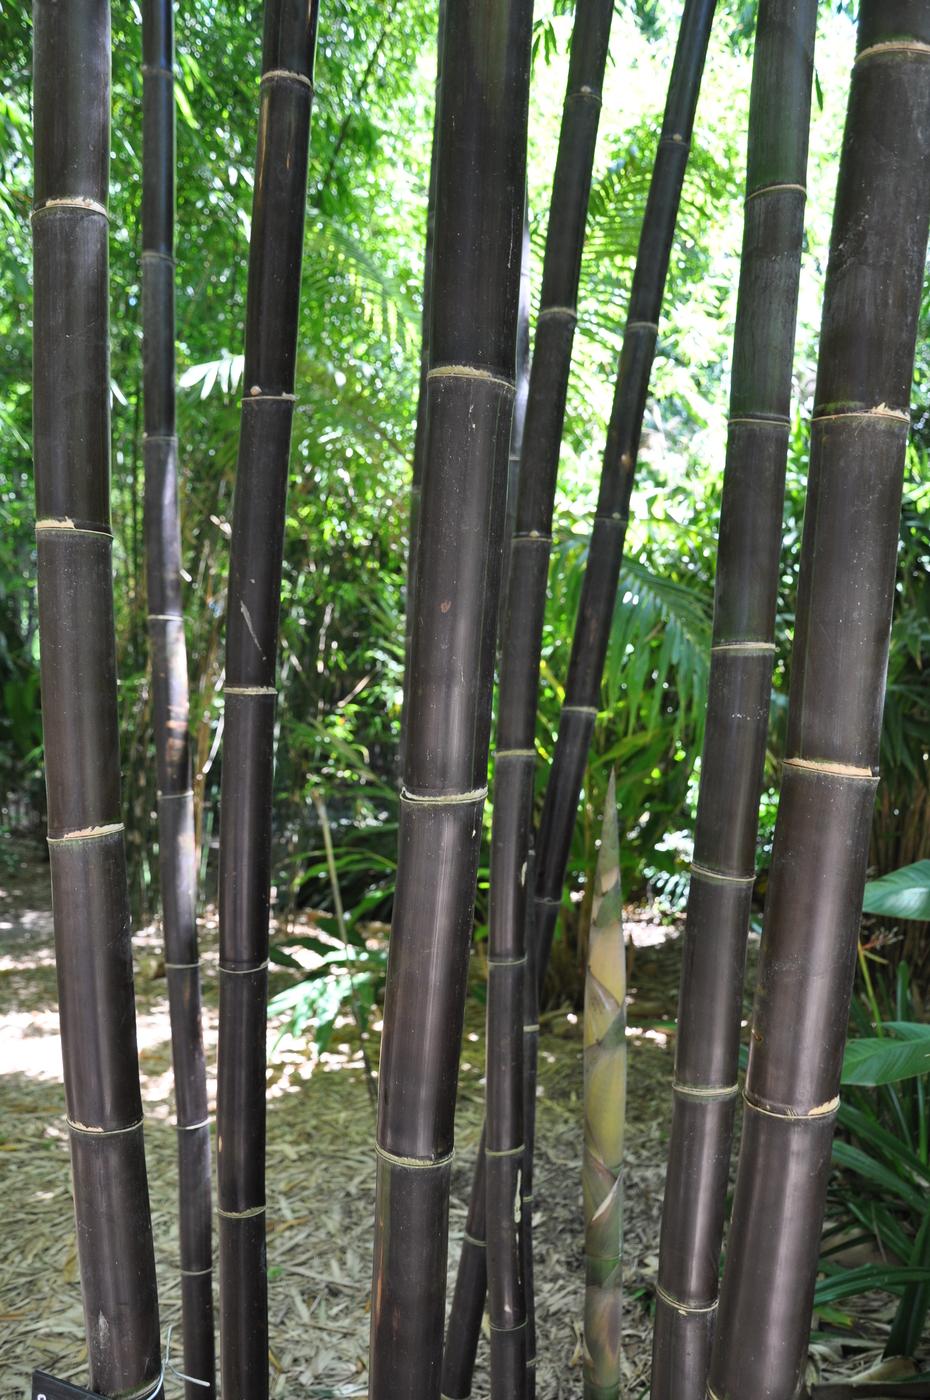 Bambusa Lako Timor Black Bamboo Land Nursery Qld Australia